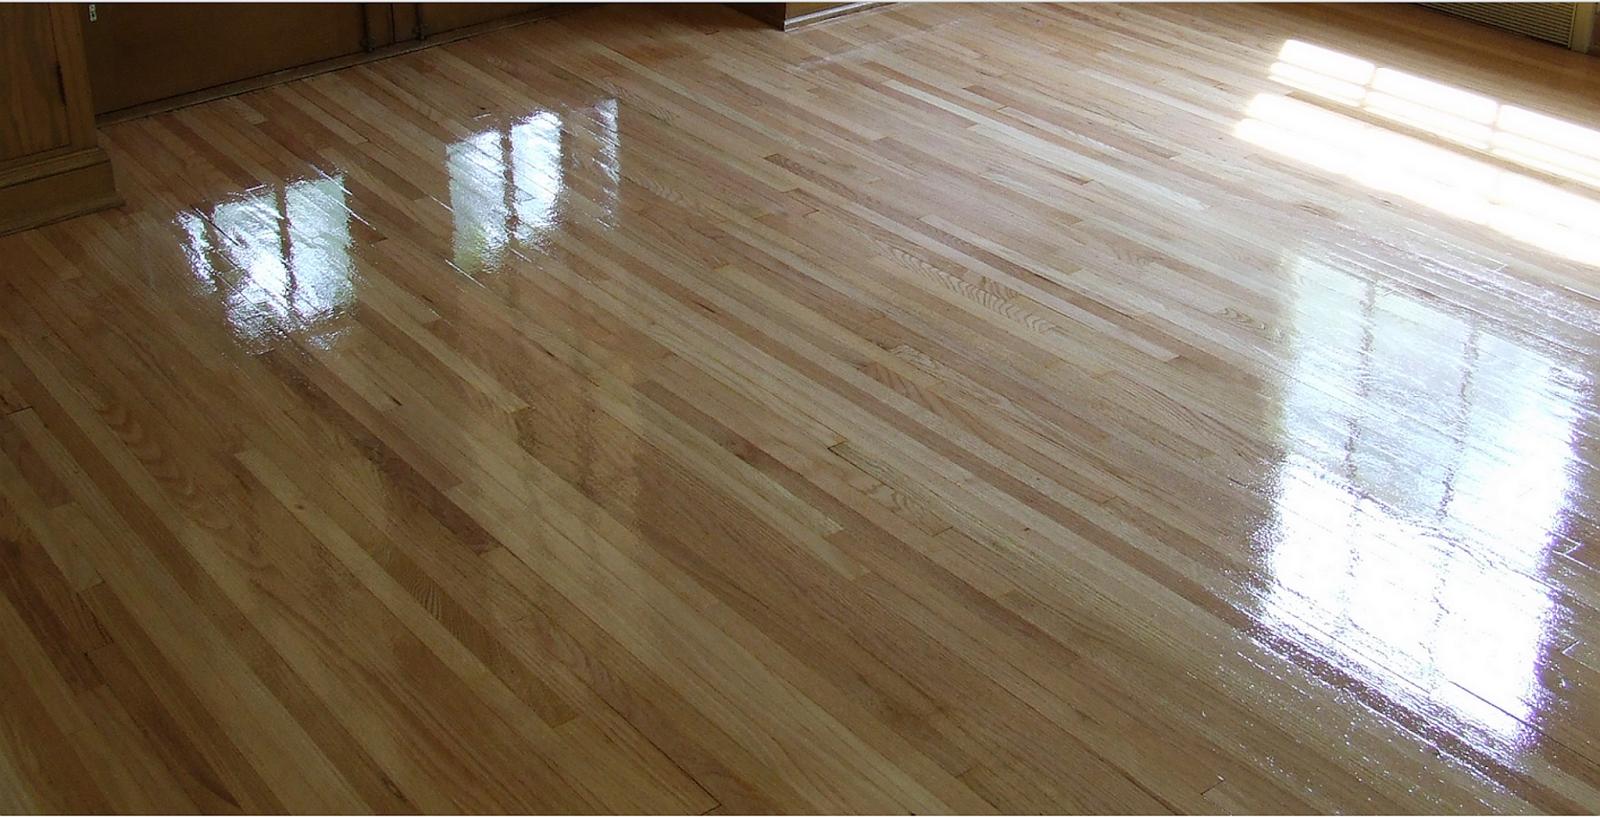 Wood flooring materials silverspikestudio for Deck flooring materials